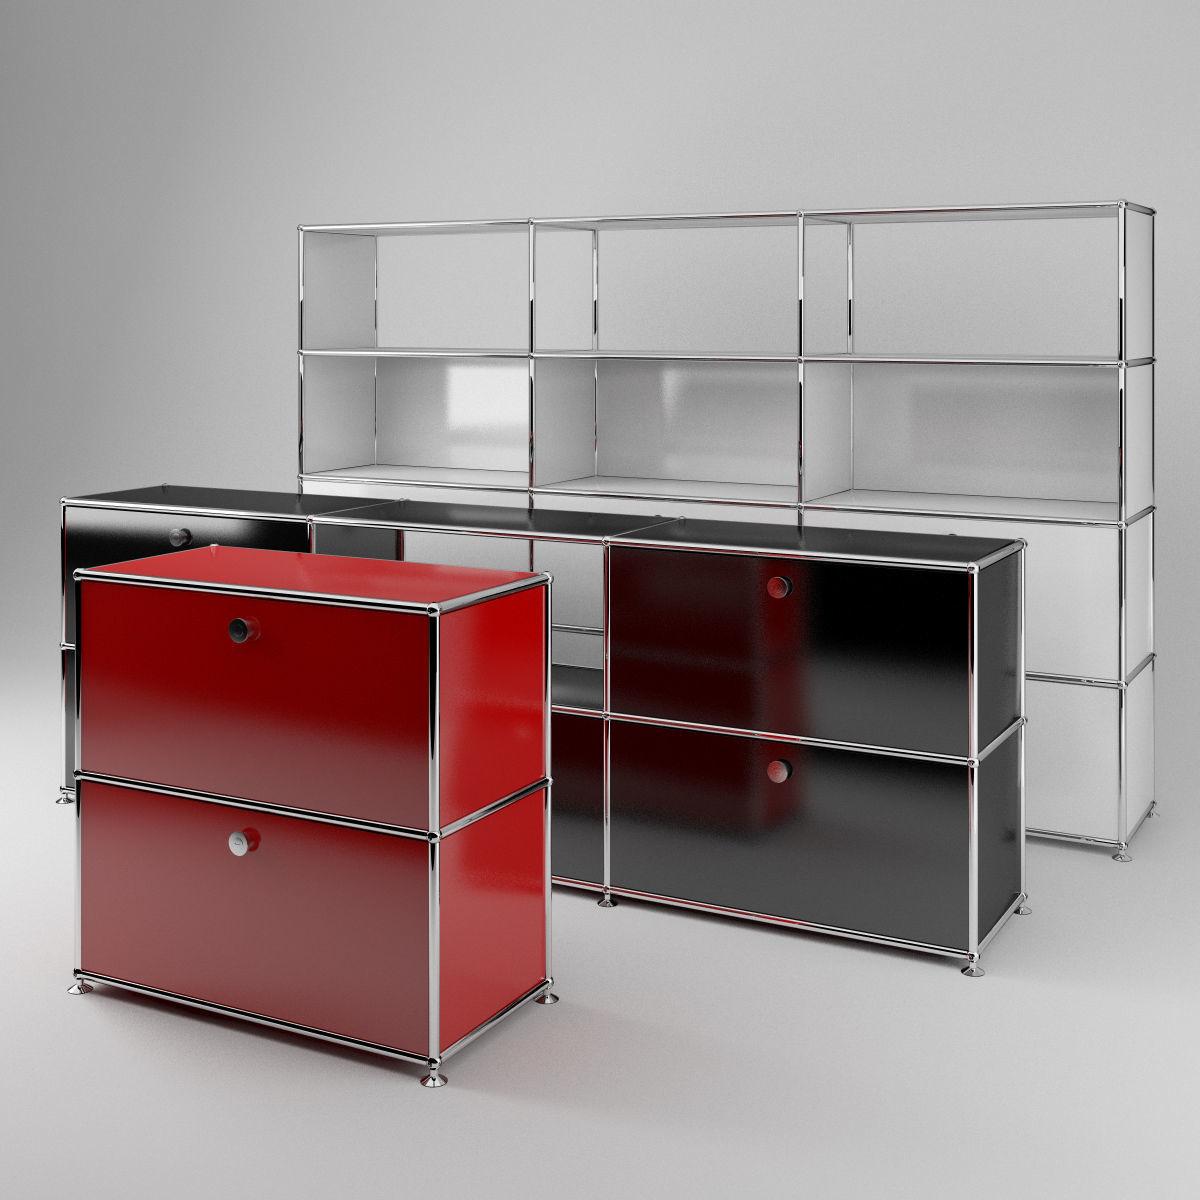 USM modular metal cabinets